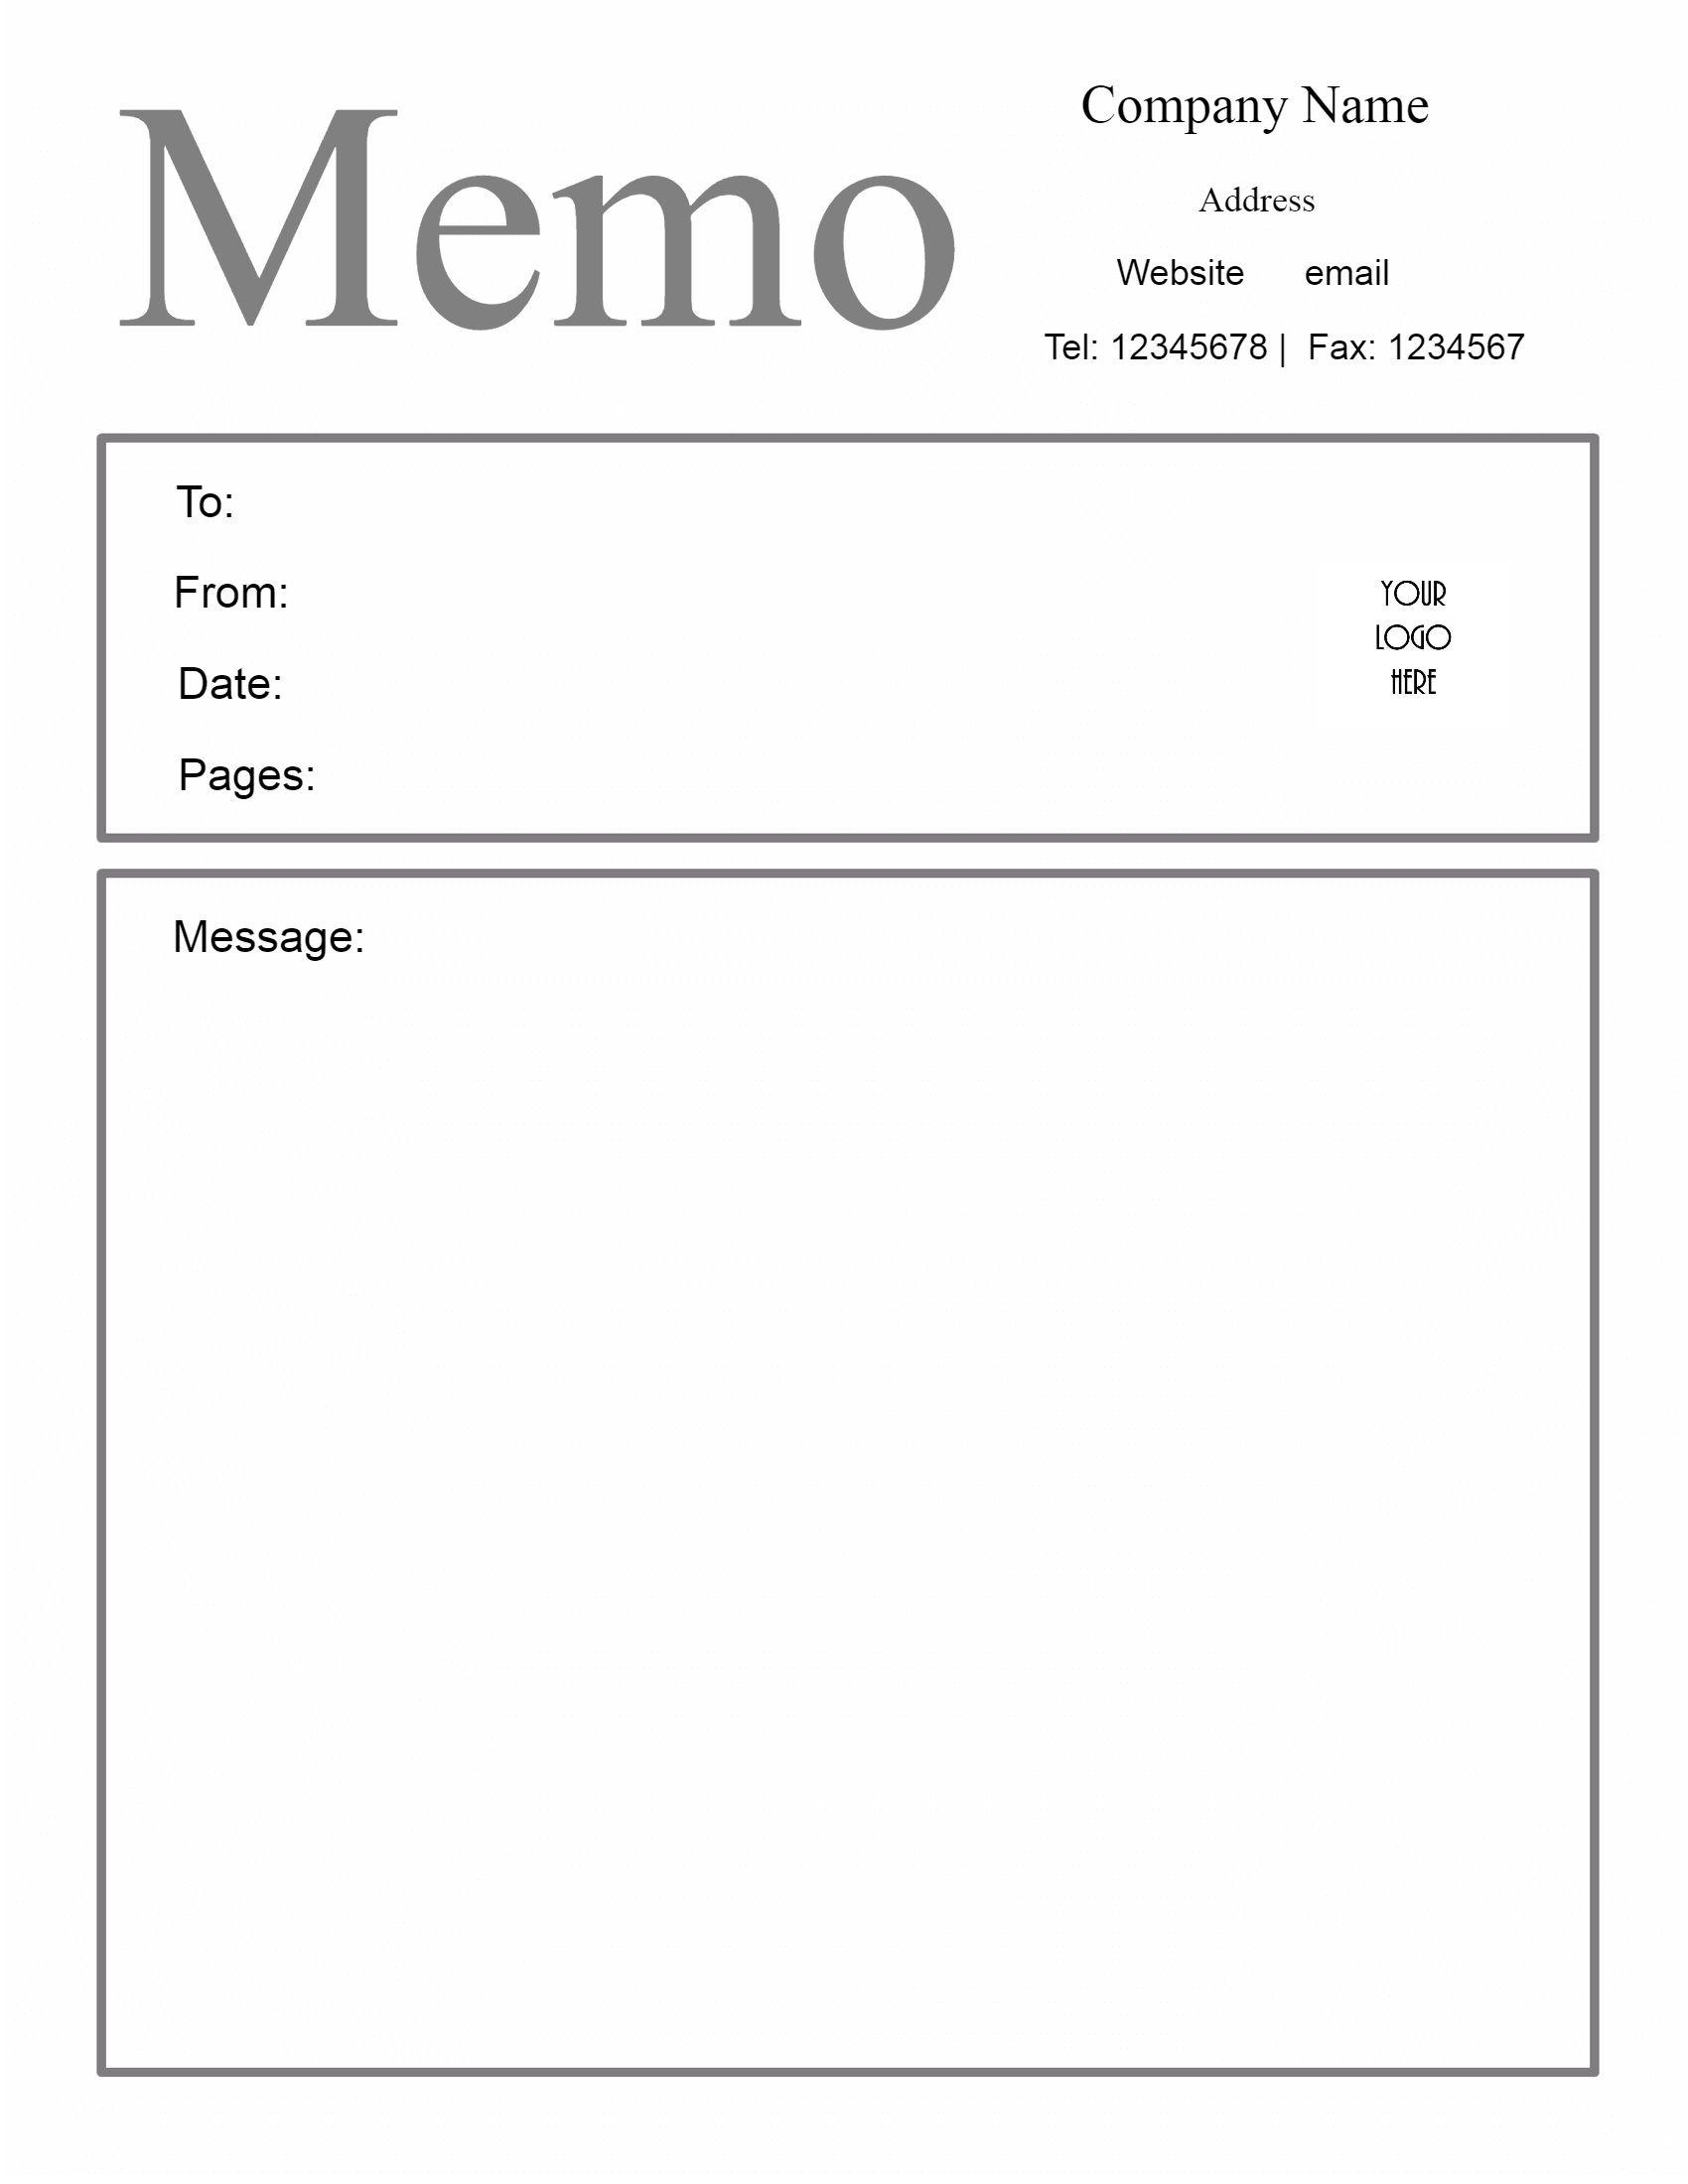 008 Rare Memo Template For Word High Resolution  Free Cash Sample 2013Full